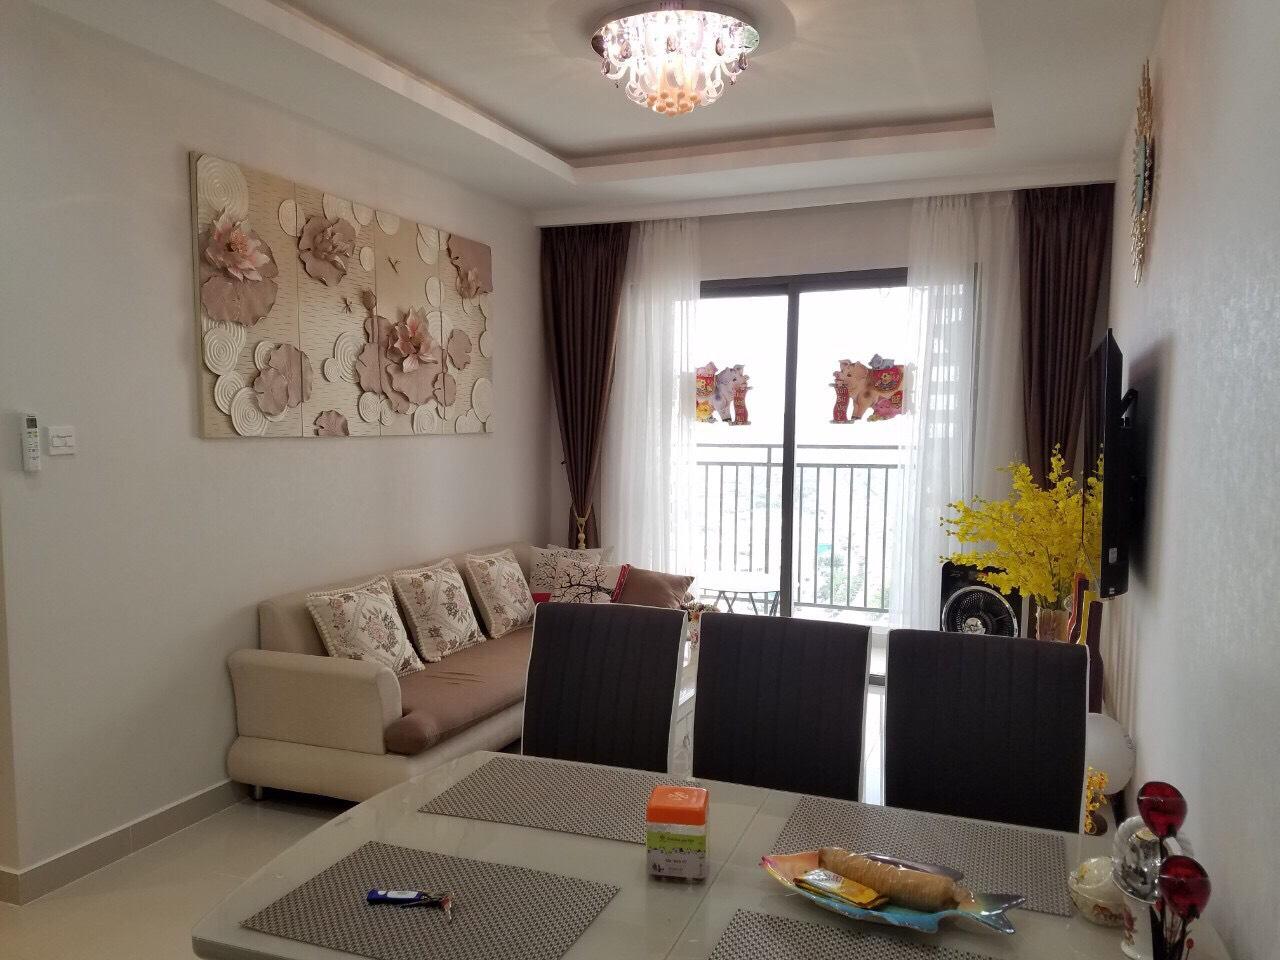 2PN Full nội thất cao cấp giá tốt tại The Sun Avenue - ID 010015